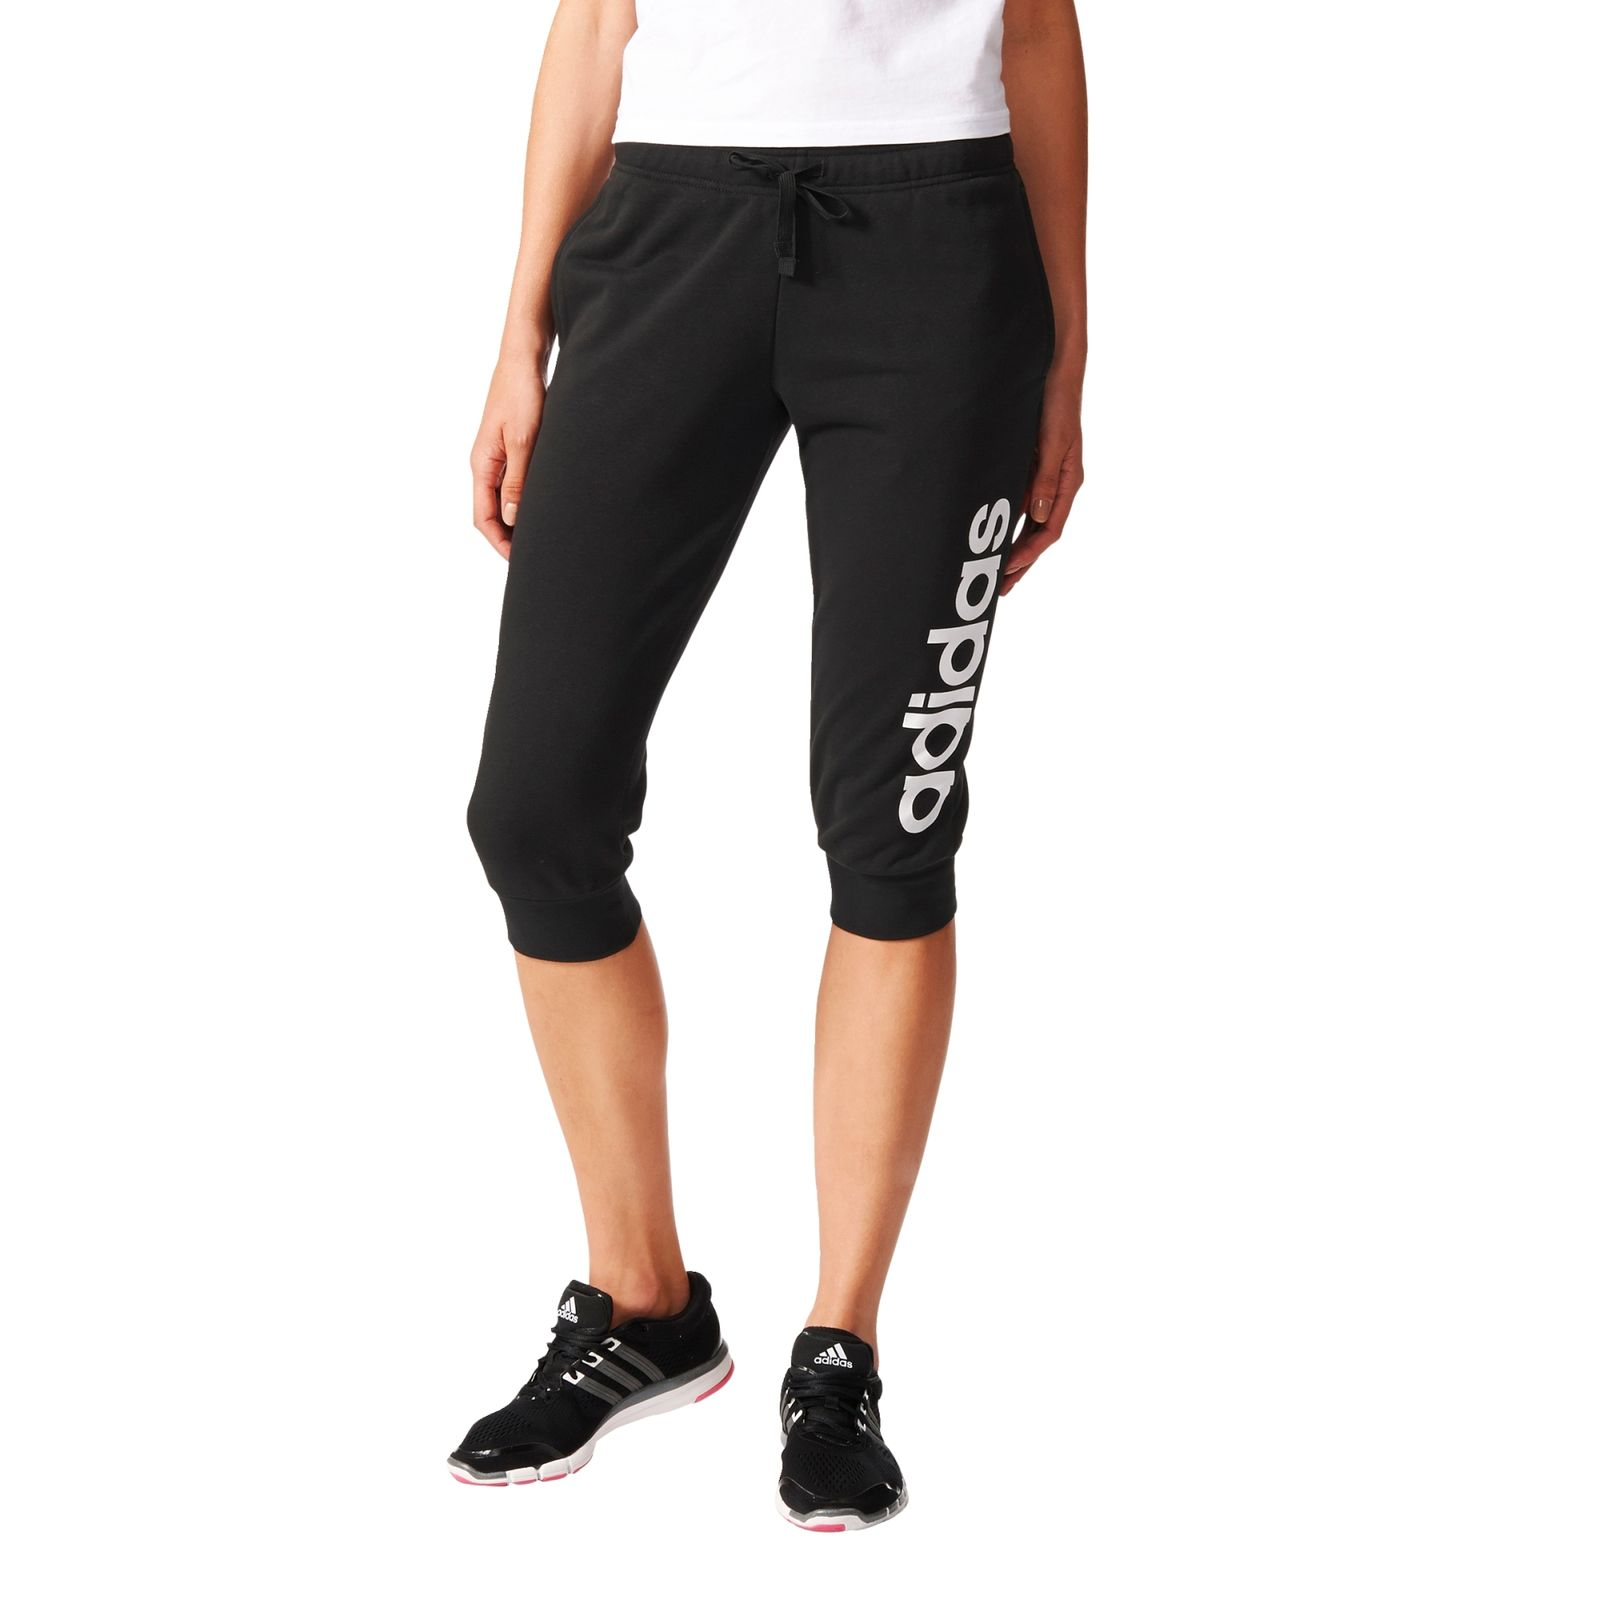 cf798489886bc6 adidas Performance Damen Sport Fitness Hose ESS Linear 3 4 Pant schwarz  weiß. Artikelzustand  NEU. Artikelbild 1. Essentials Dreiviertelhose